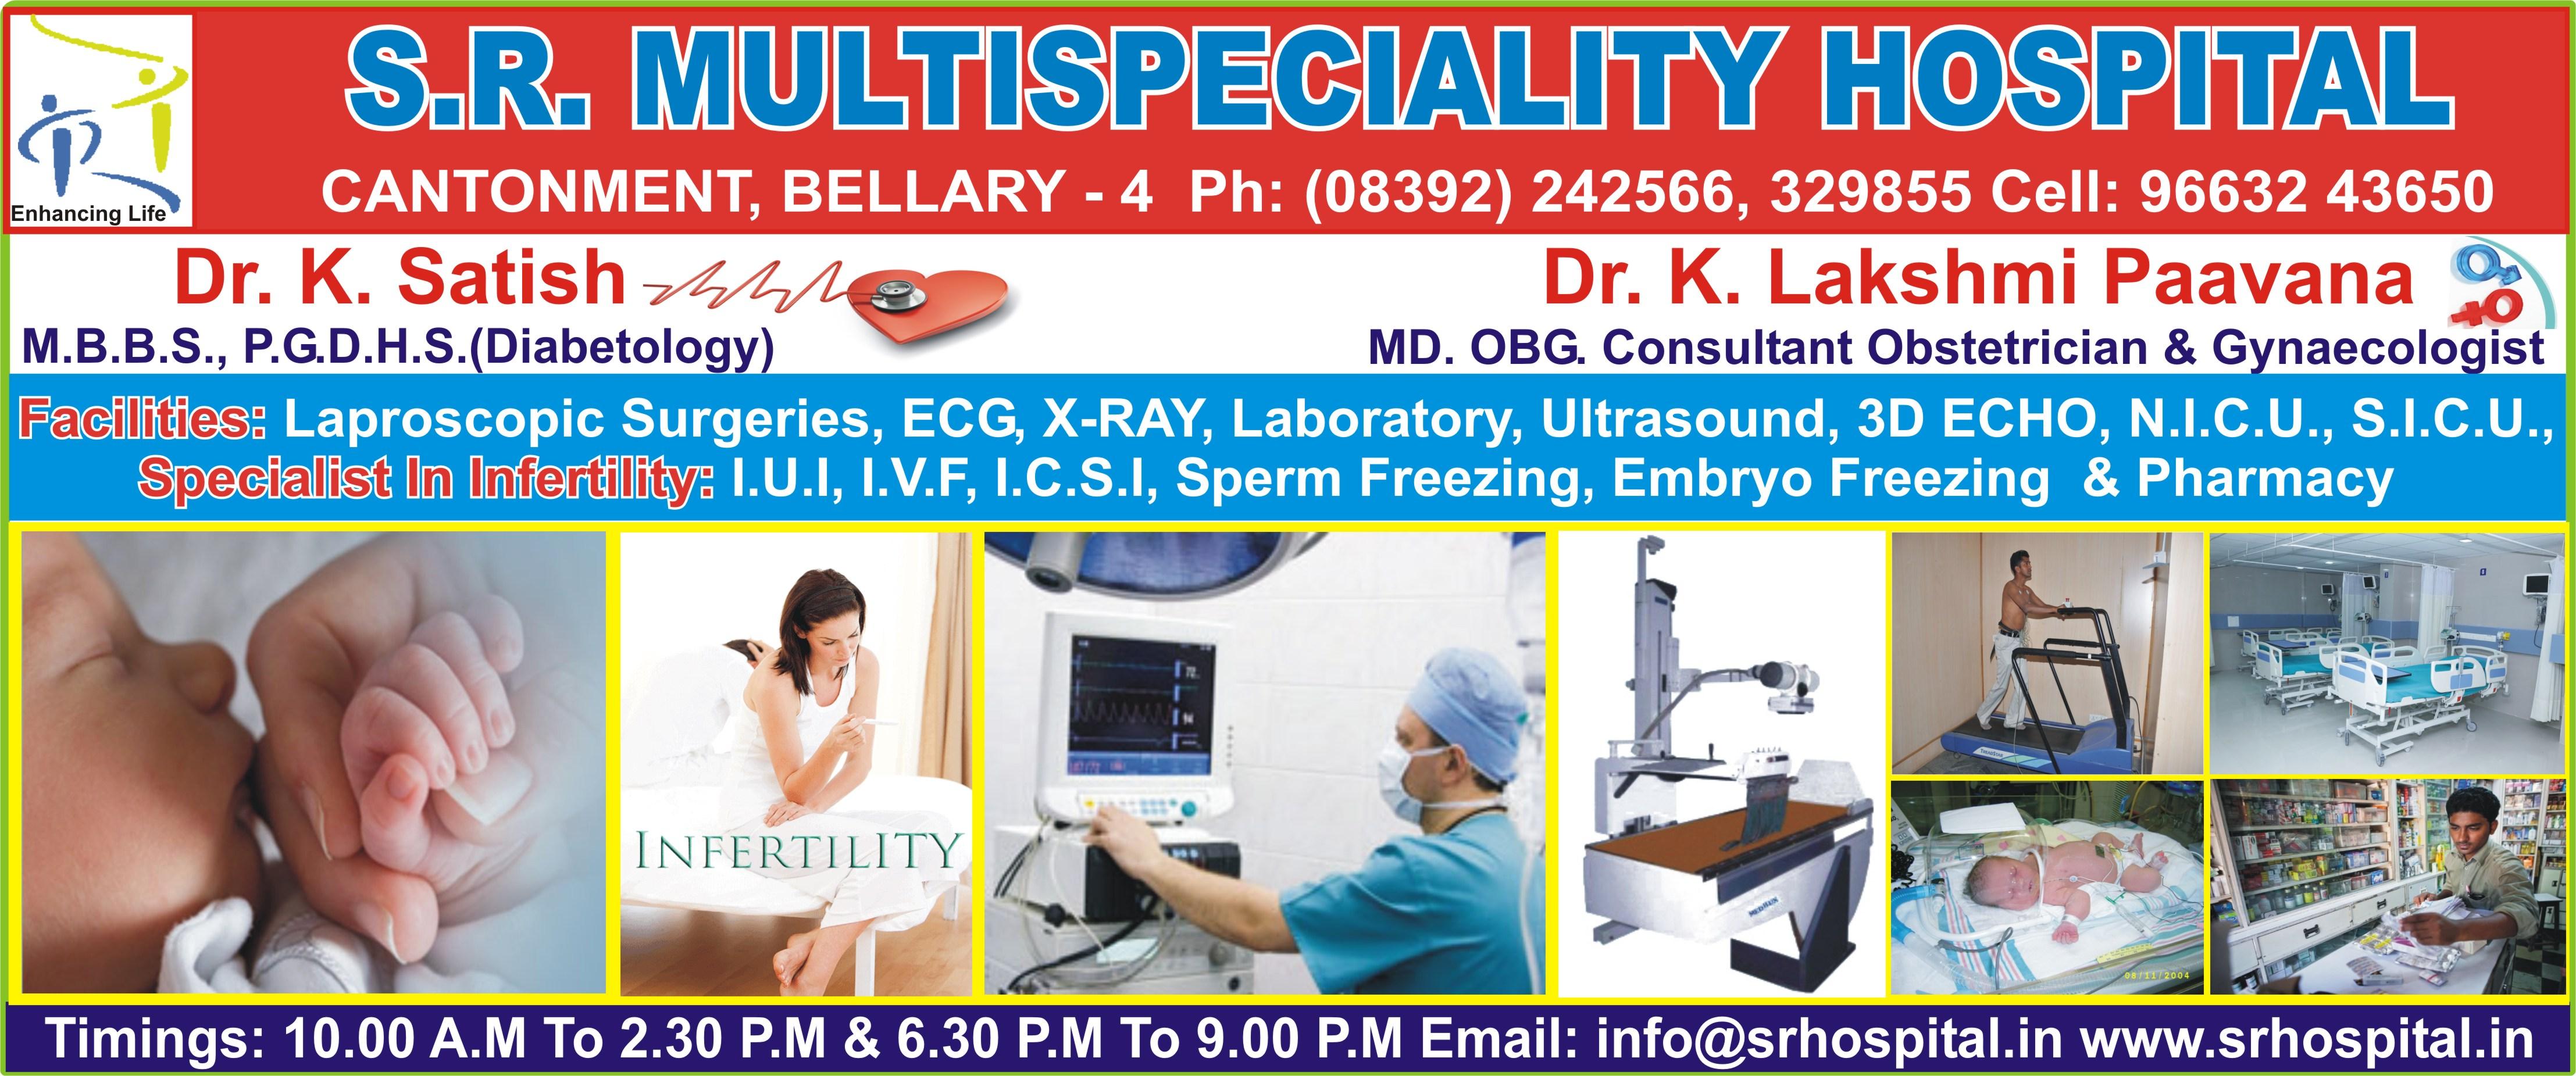 S. R. Multispeciality Hospital